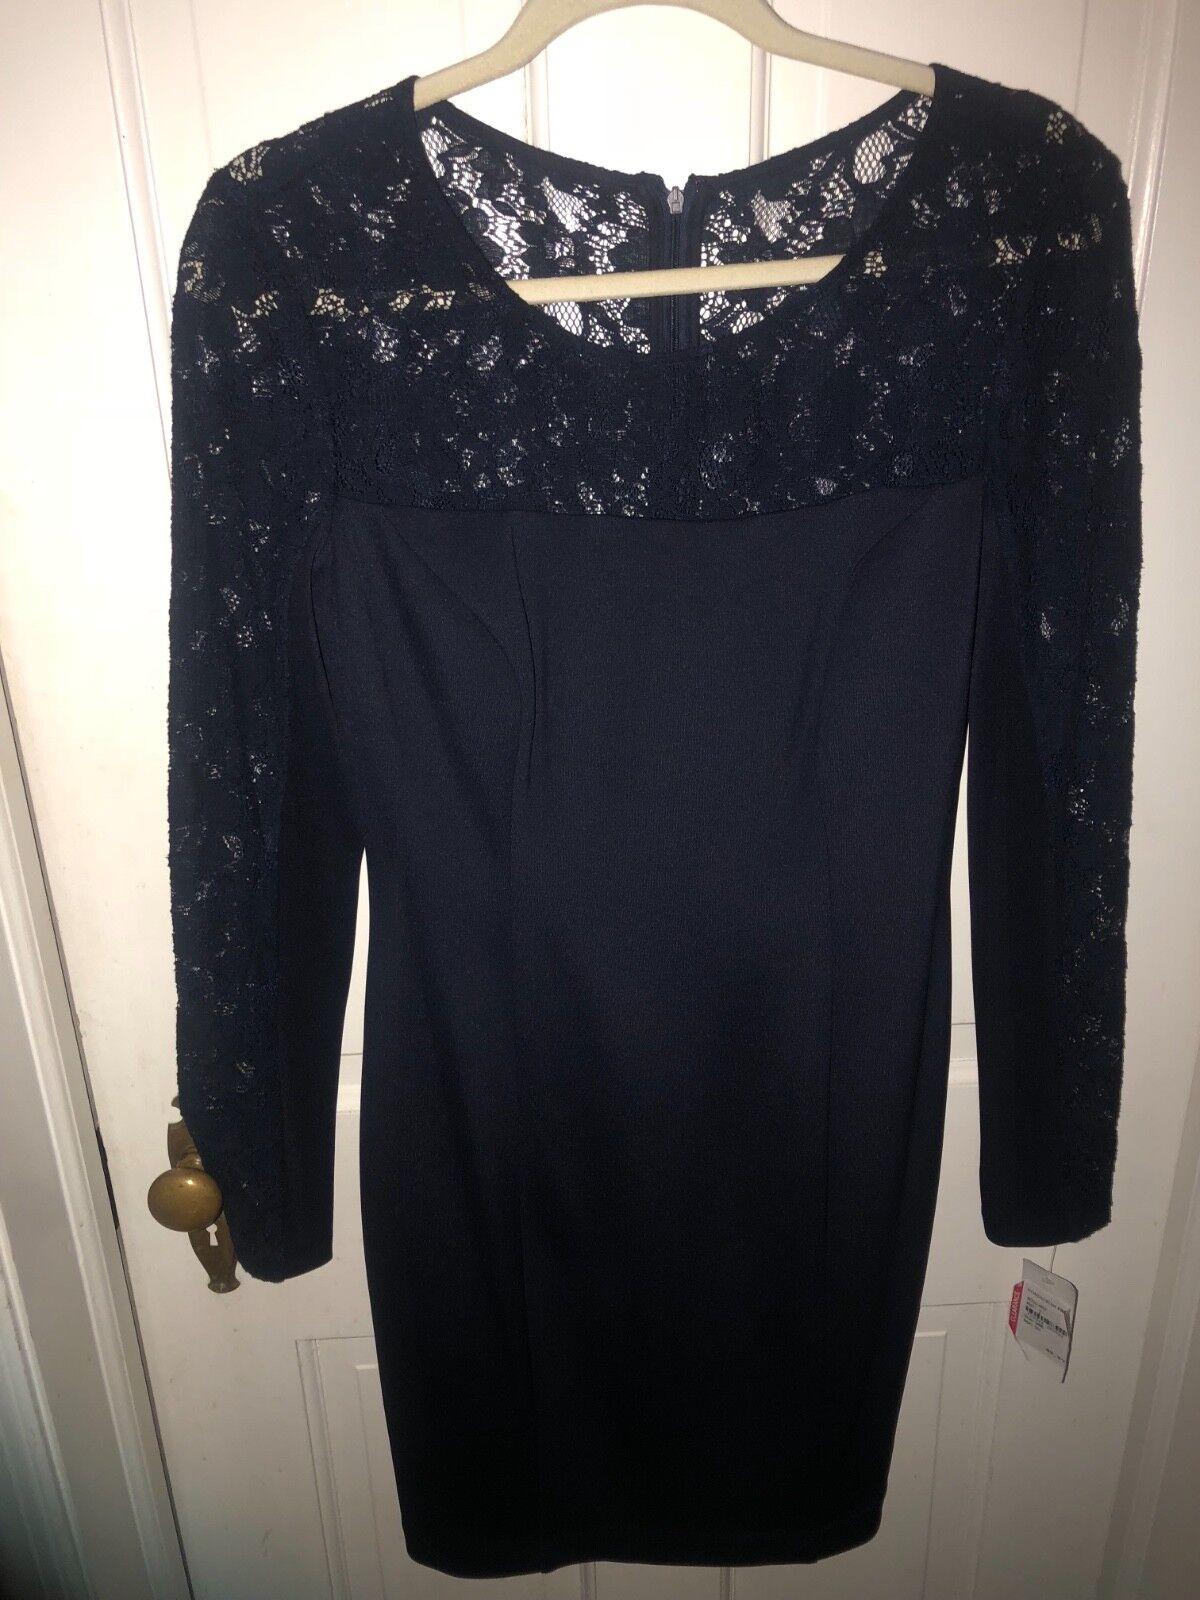 NWT Jessica Simpson navy Blau cocktail dress with lace Größe 8